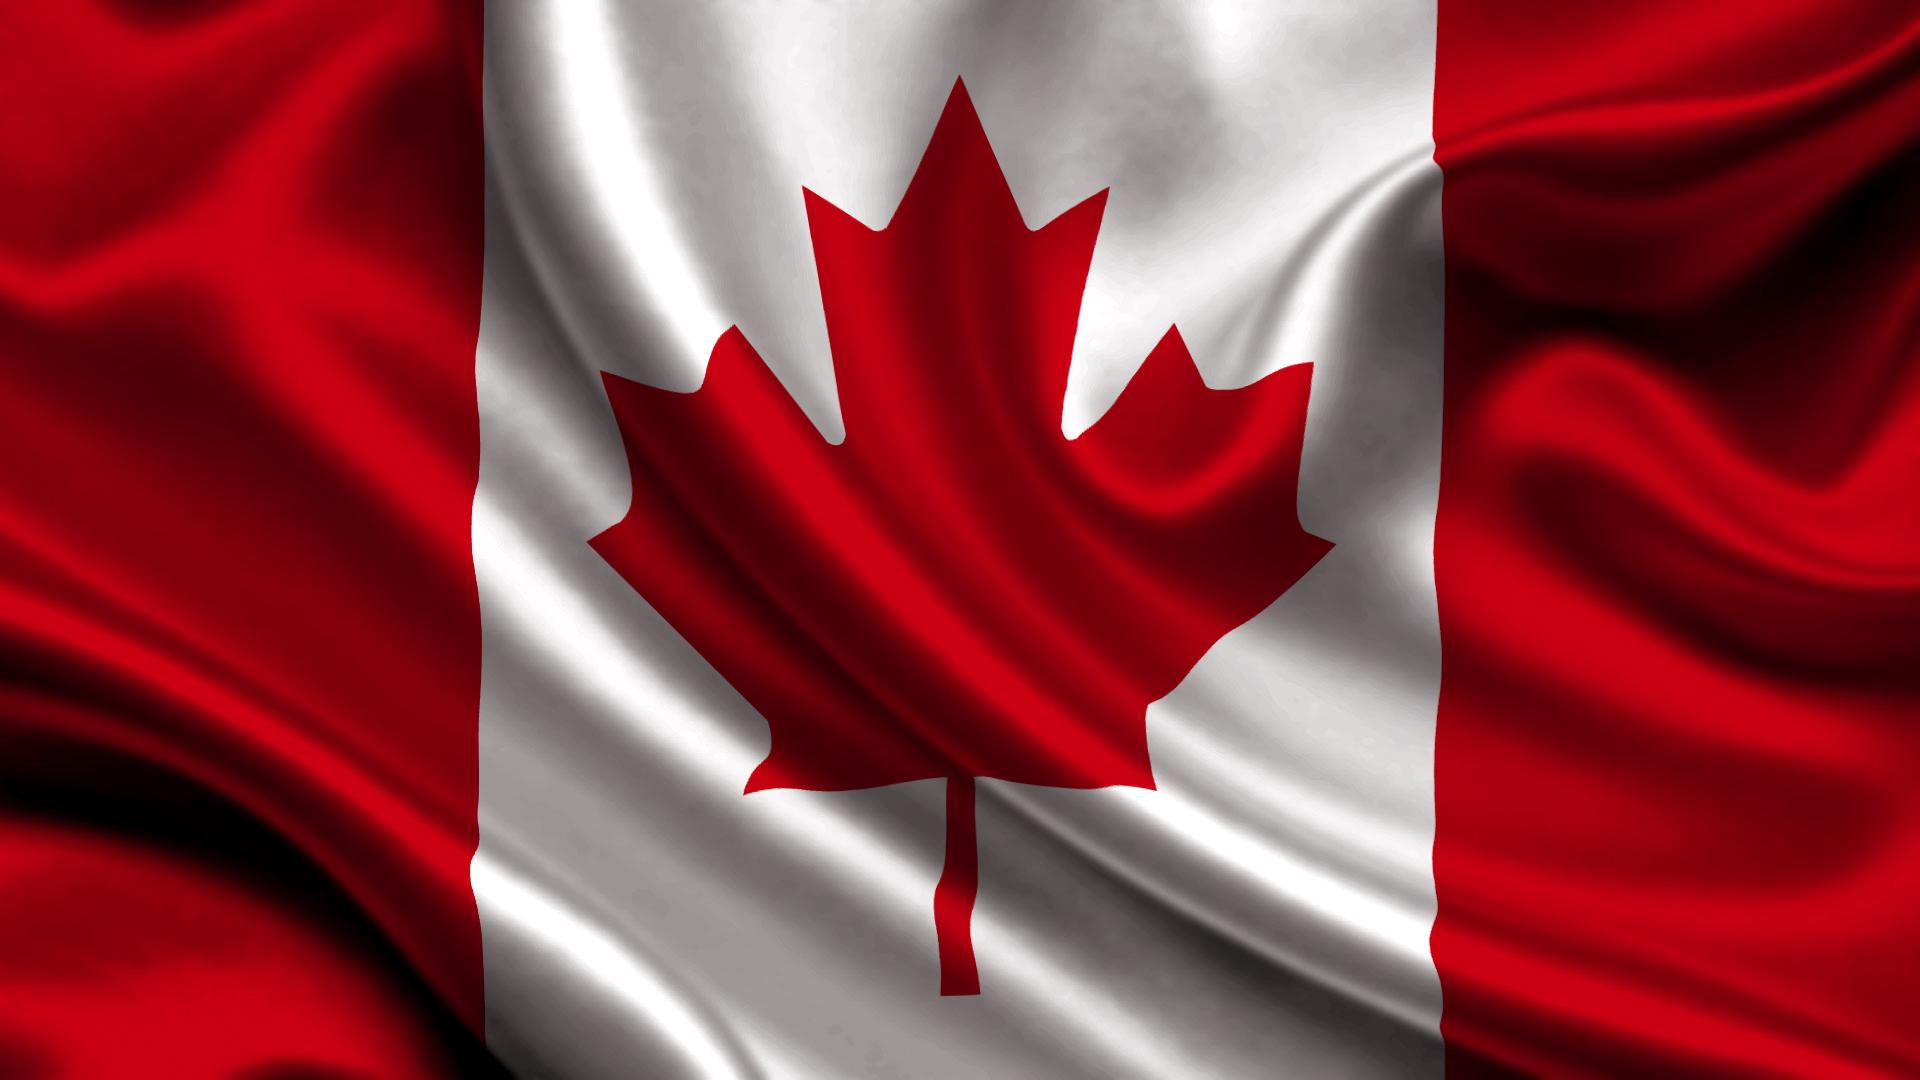 Canada Flag HD Wallpapers Download Desktop Wallpaper Images 1920x1080